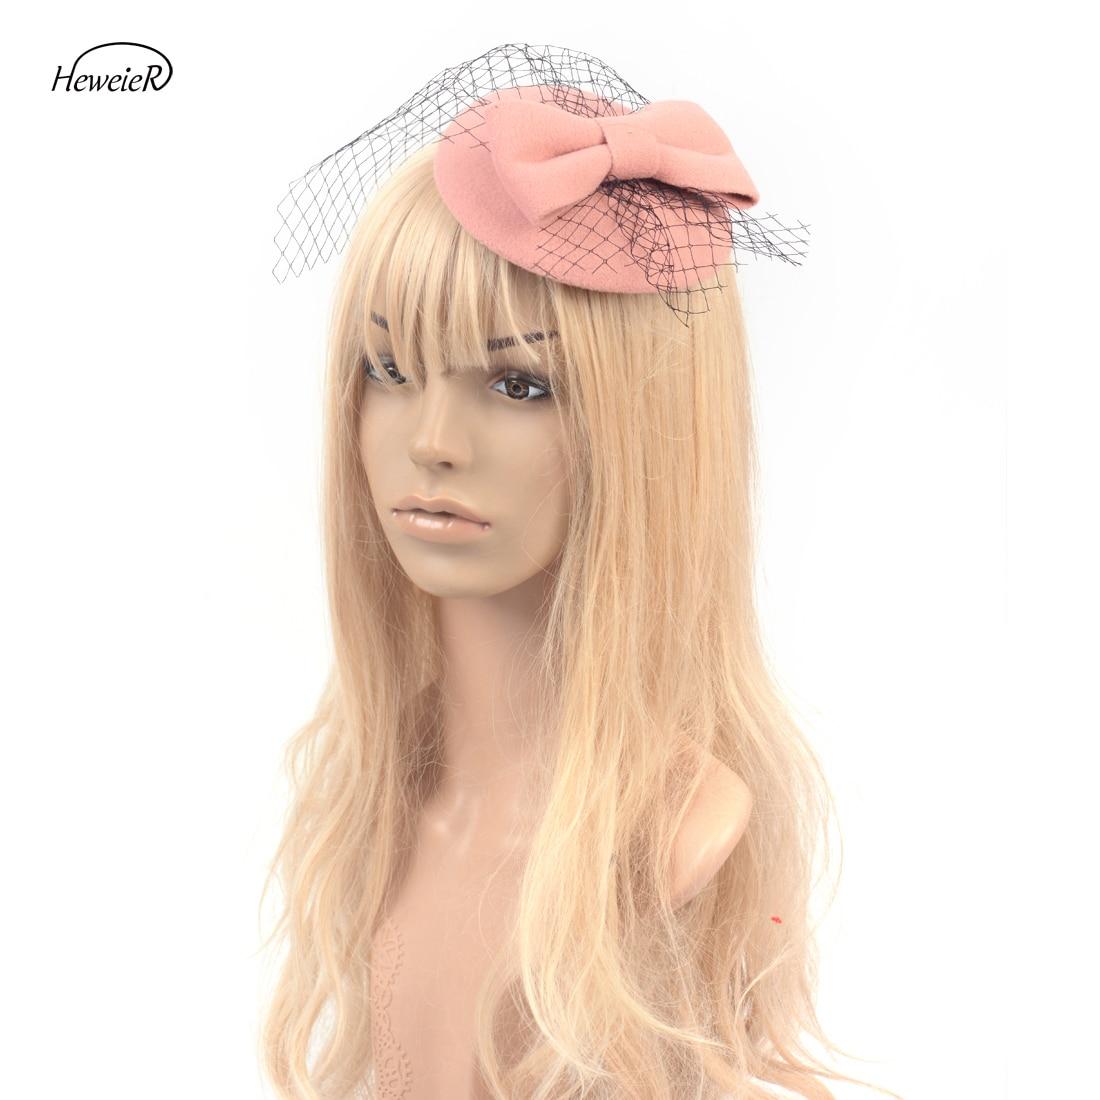 Lady Women Girls Fancy Headdress Pillbox Hat Bowknot Veils Fascinator Hair Clips Headwear Cocktail Party Accessories 4 Colors